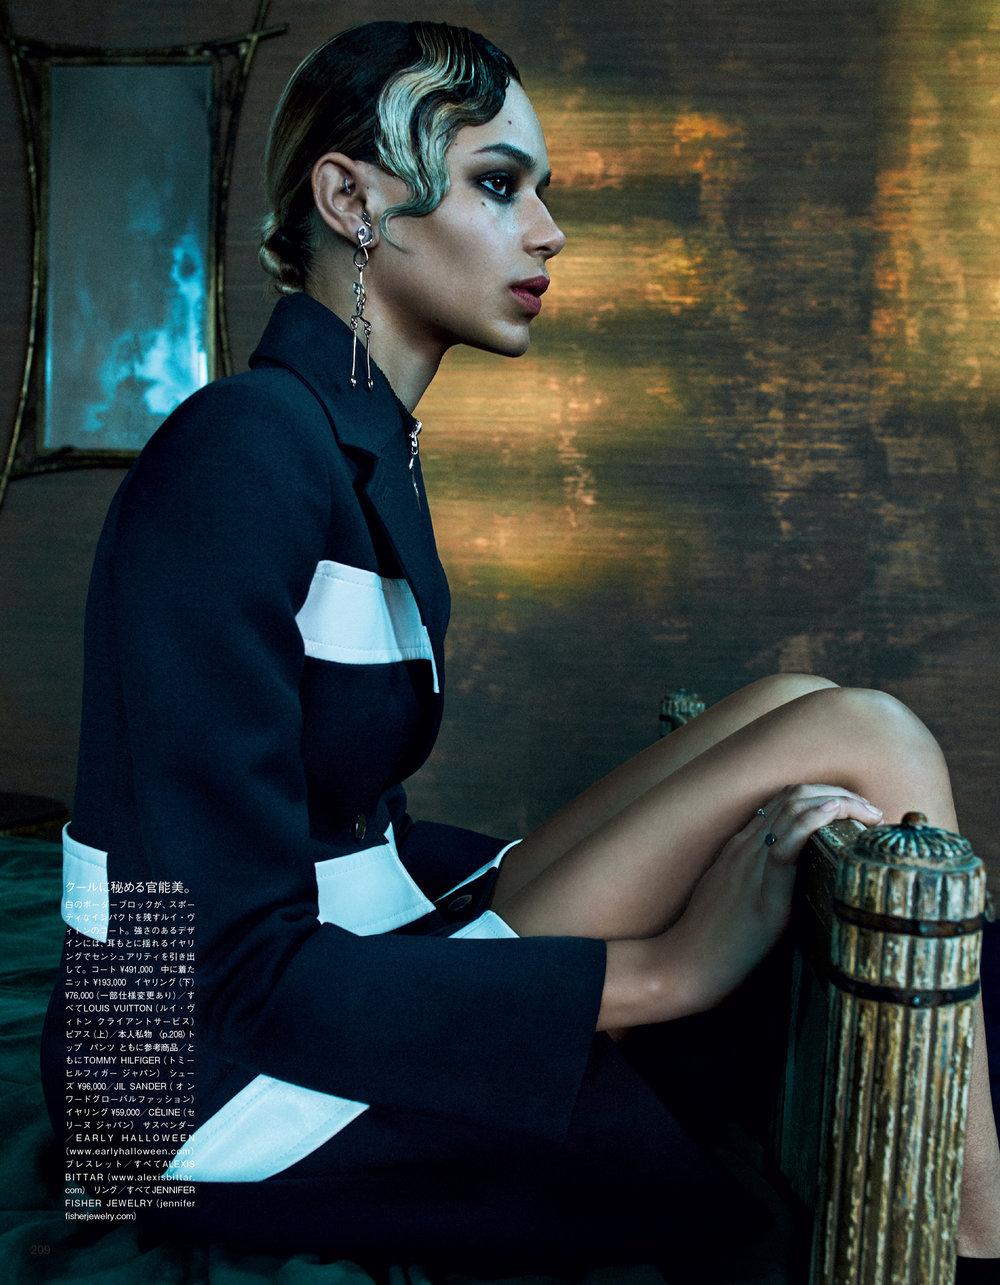 Giovanna-Battaglia-Vogue-Japan-August-2016-The-Sea-Whispers-Emma-Summerton-5.jpg